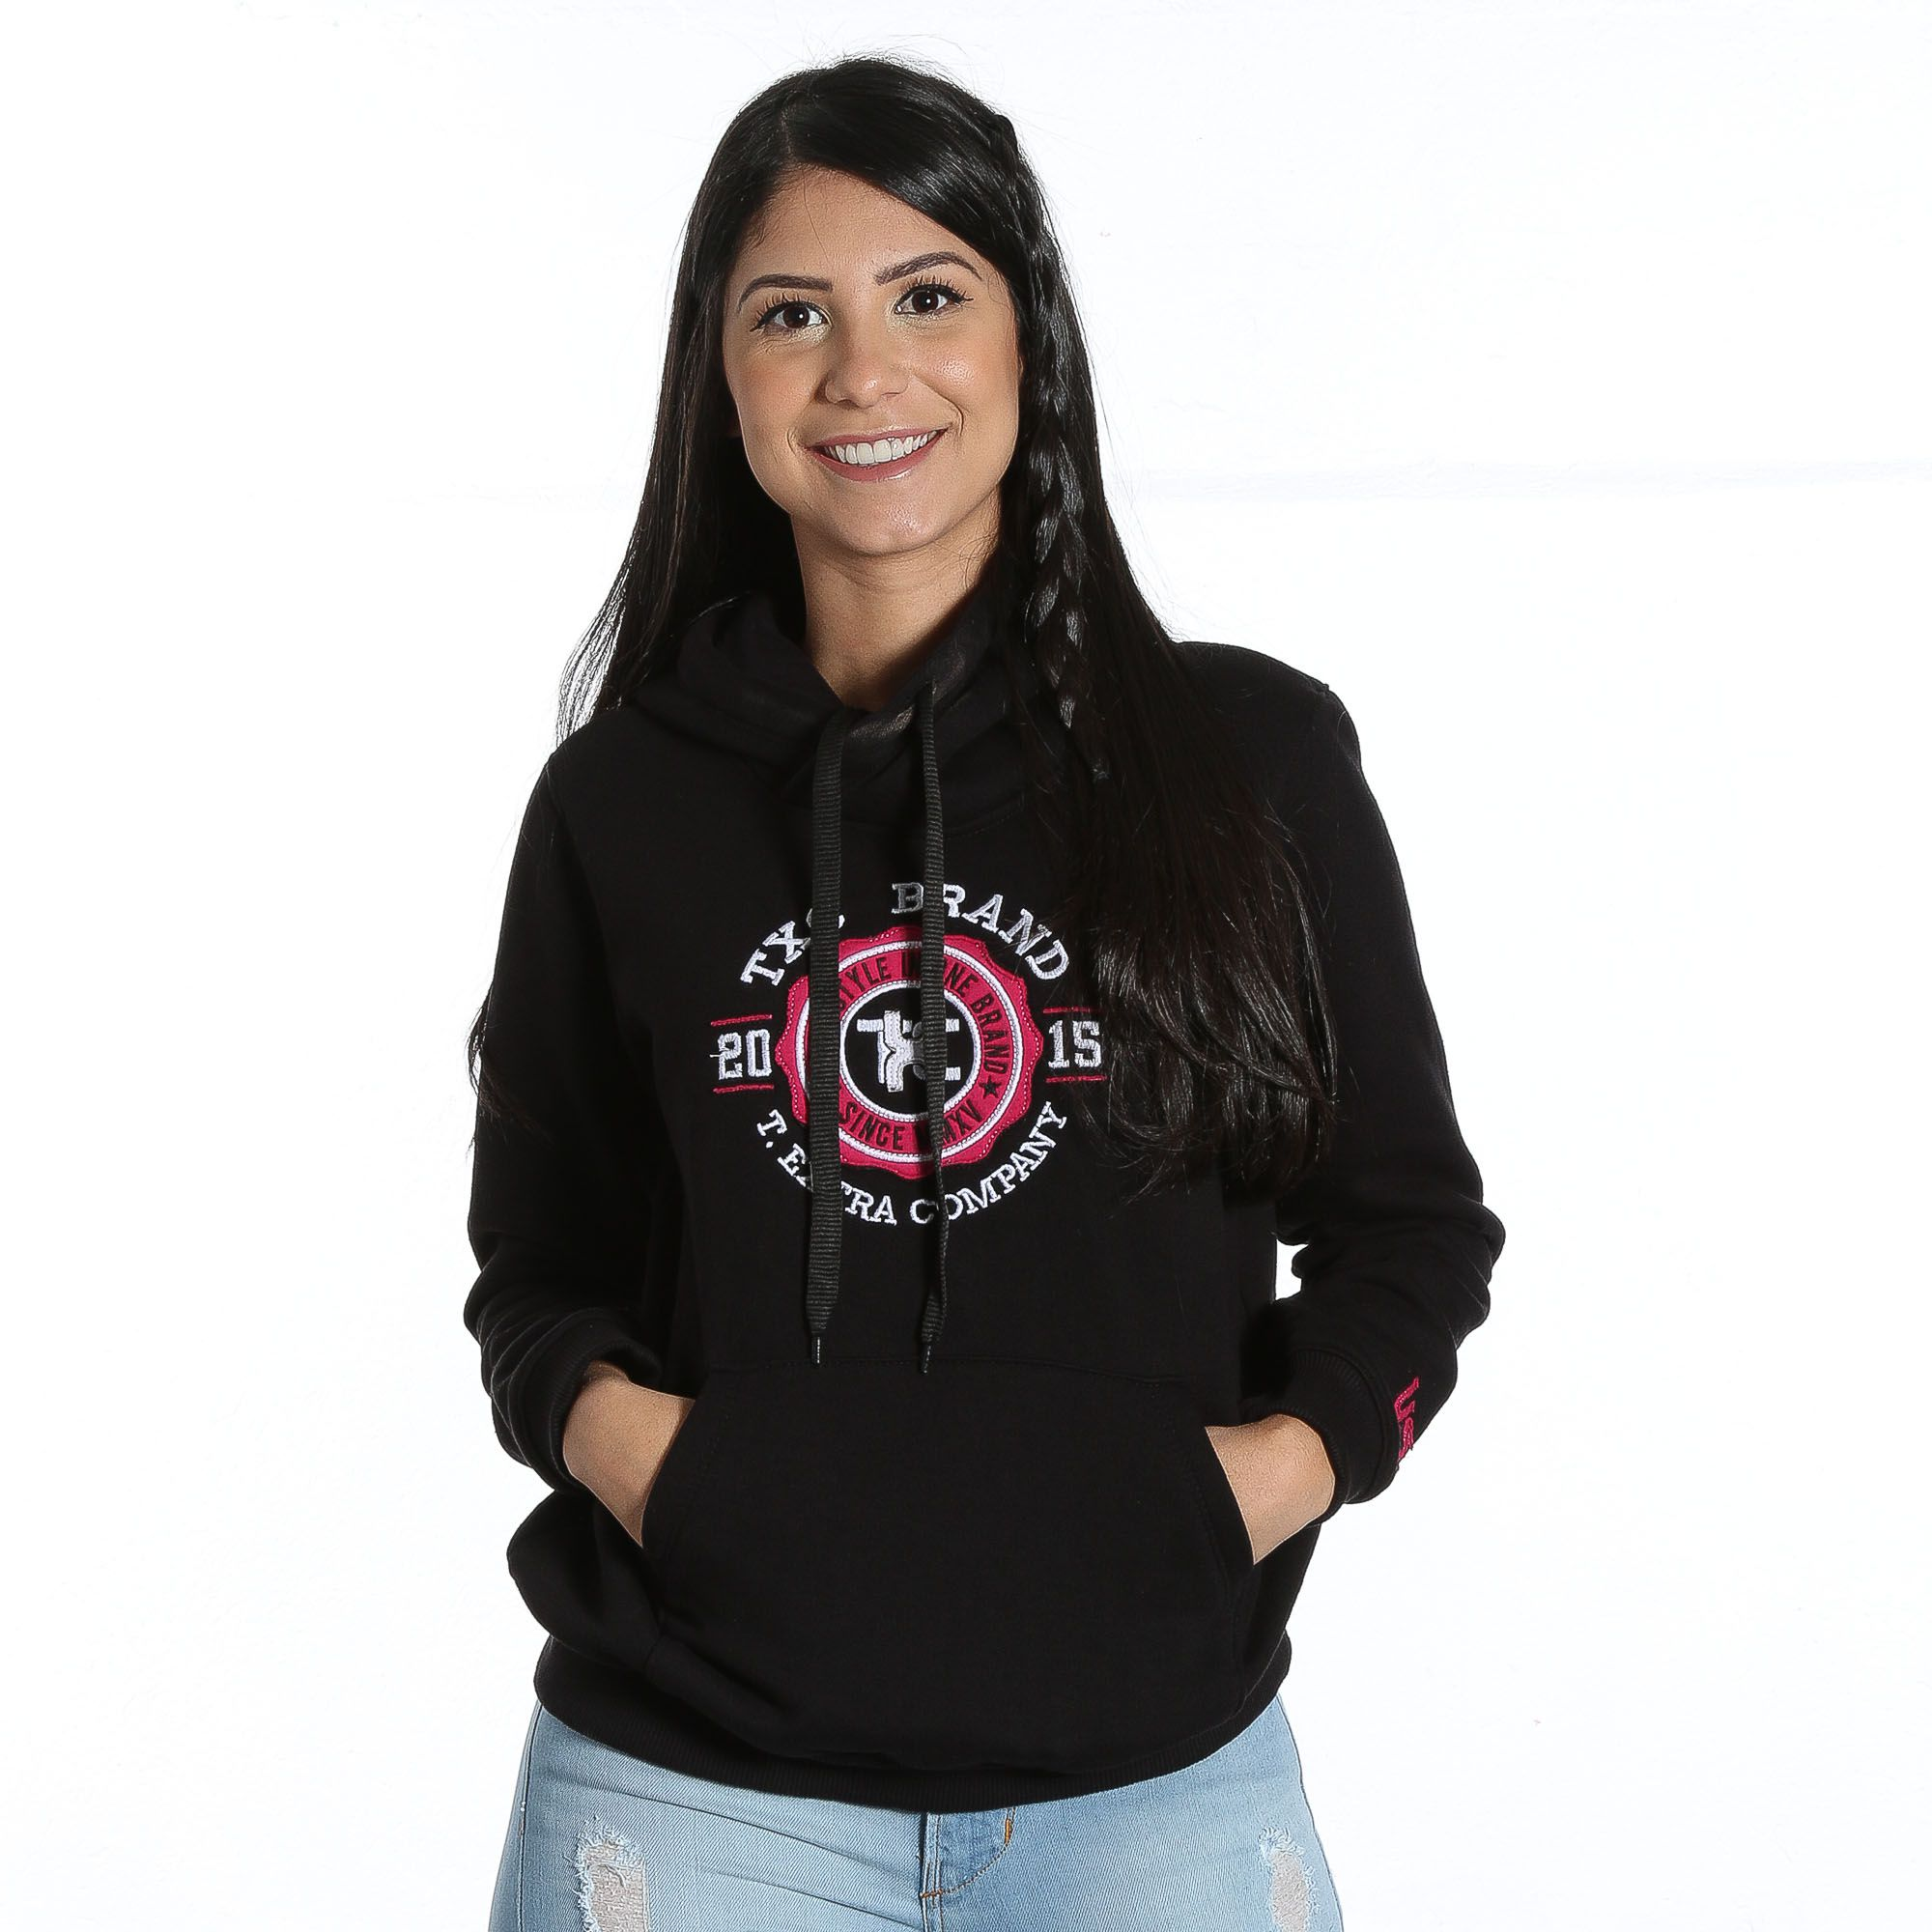 Moletom TXC Brand feminino 9015